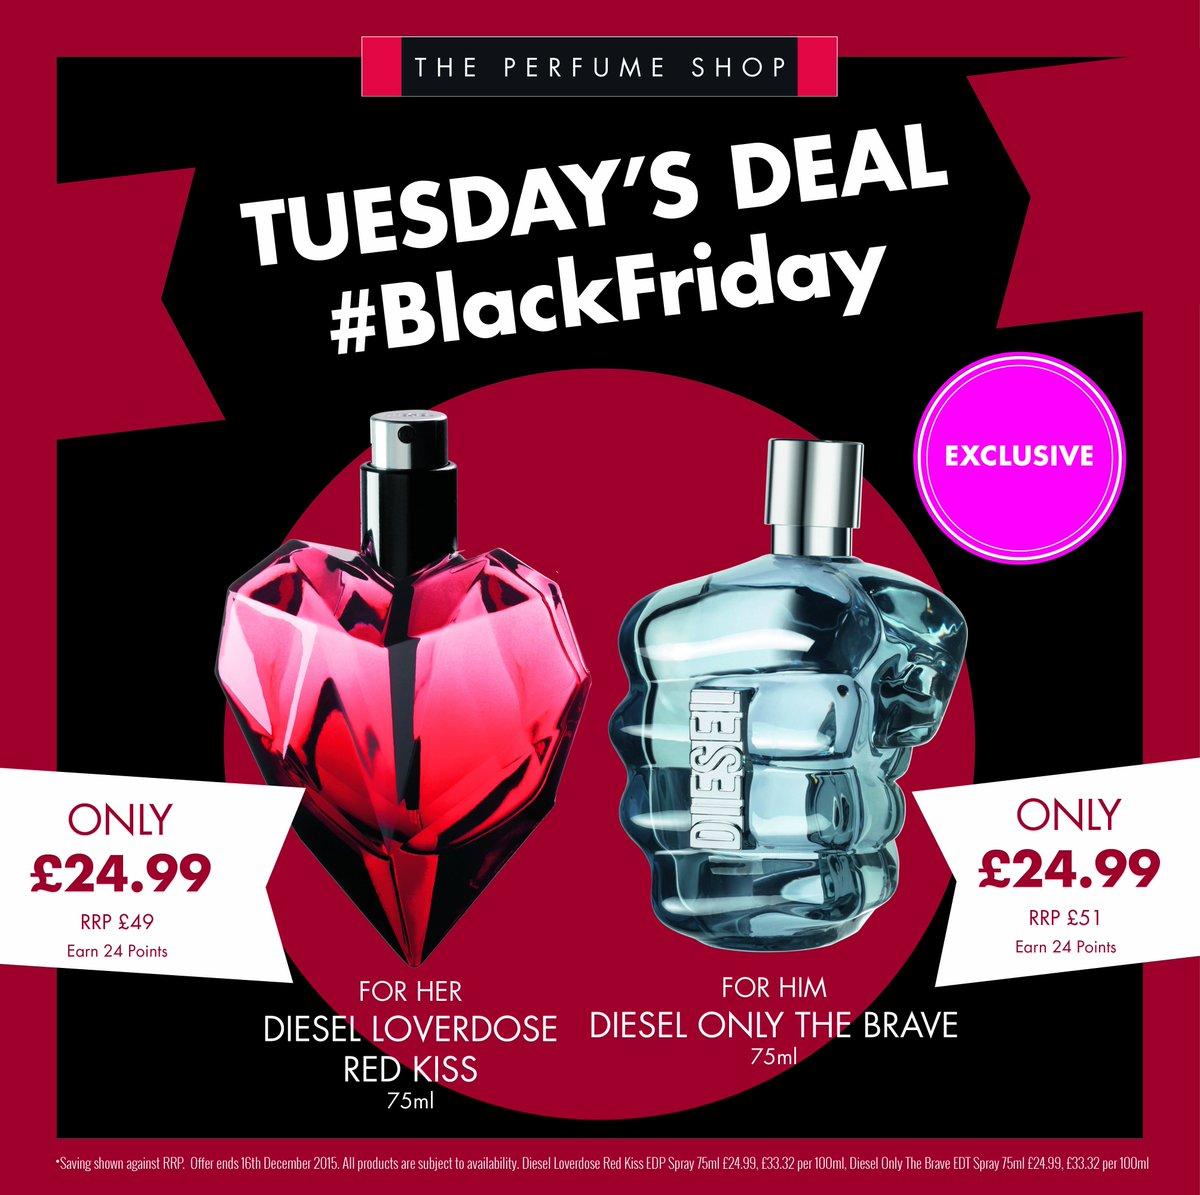 The Perfume Shop On Twitter Blackfriday Diesel Loverdose Red